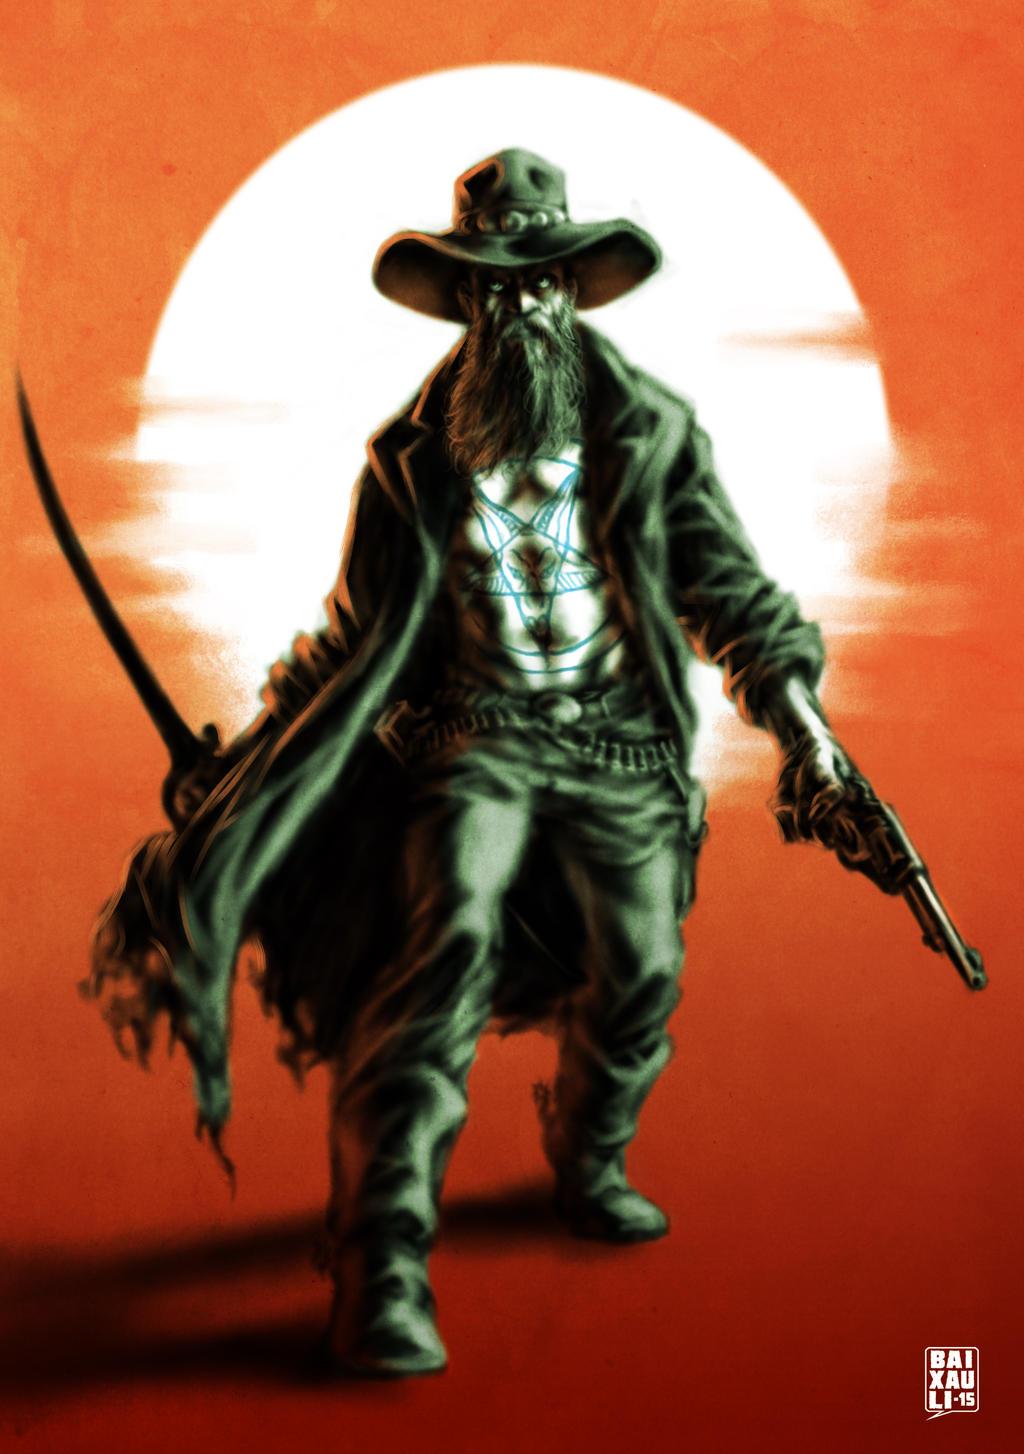 Weird Western Character by BAI-XAU-LI